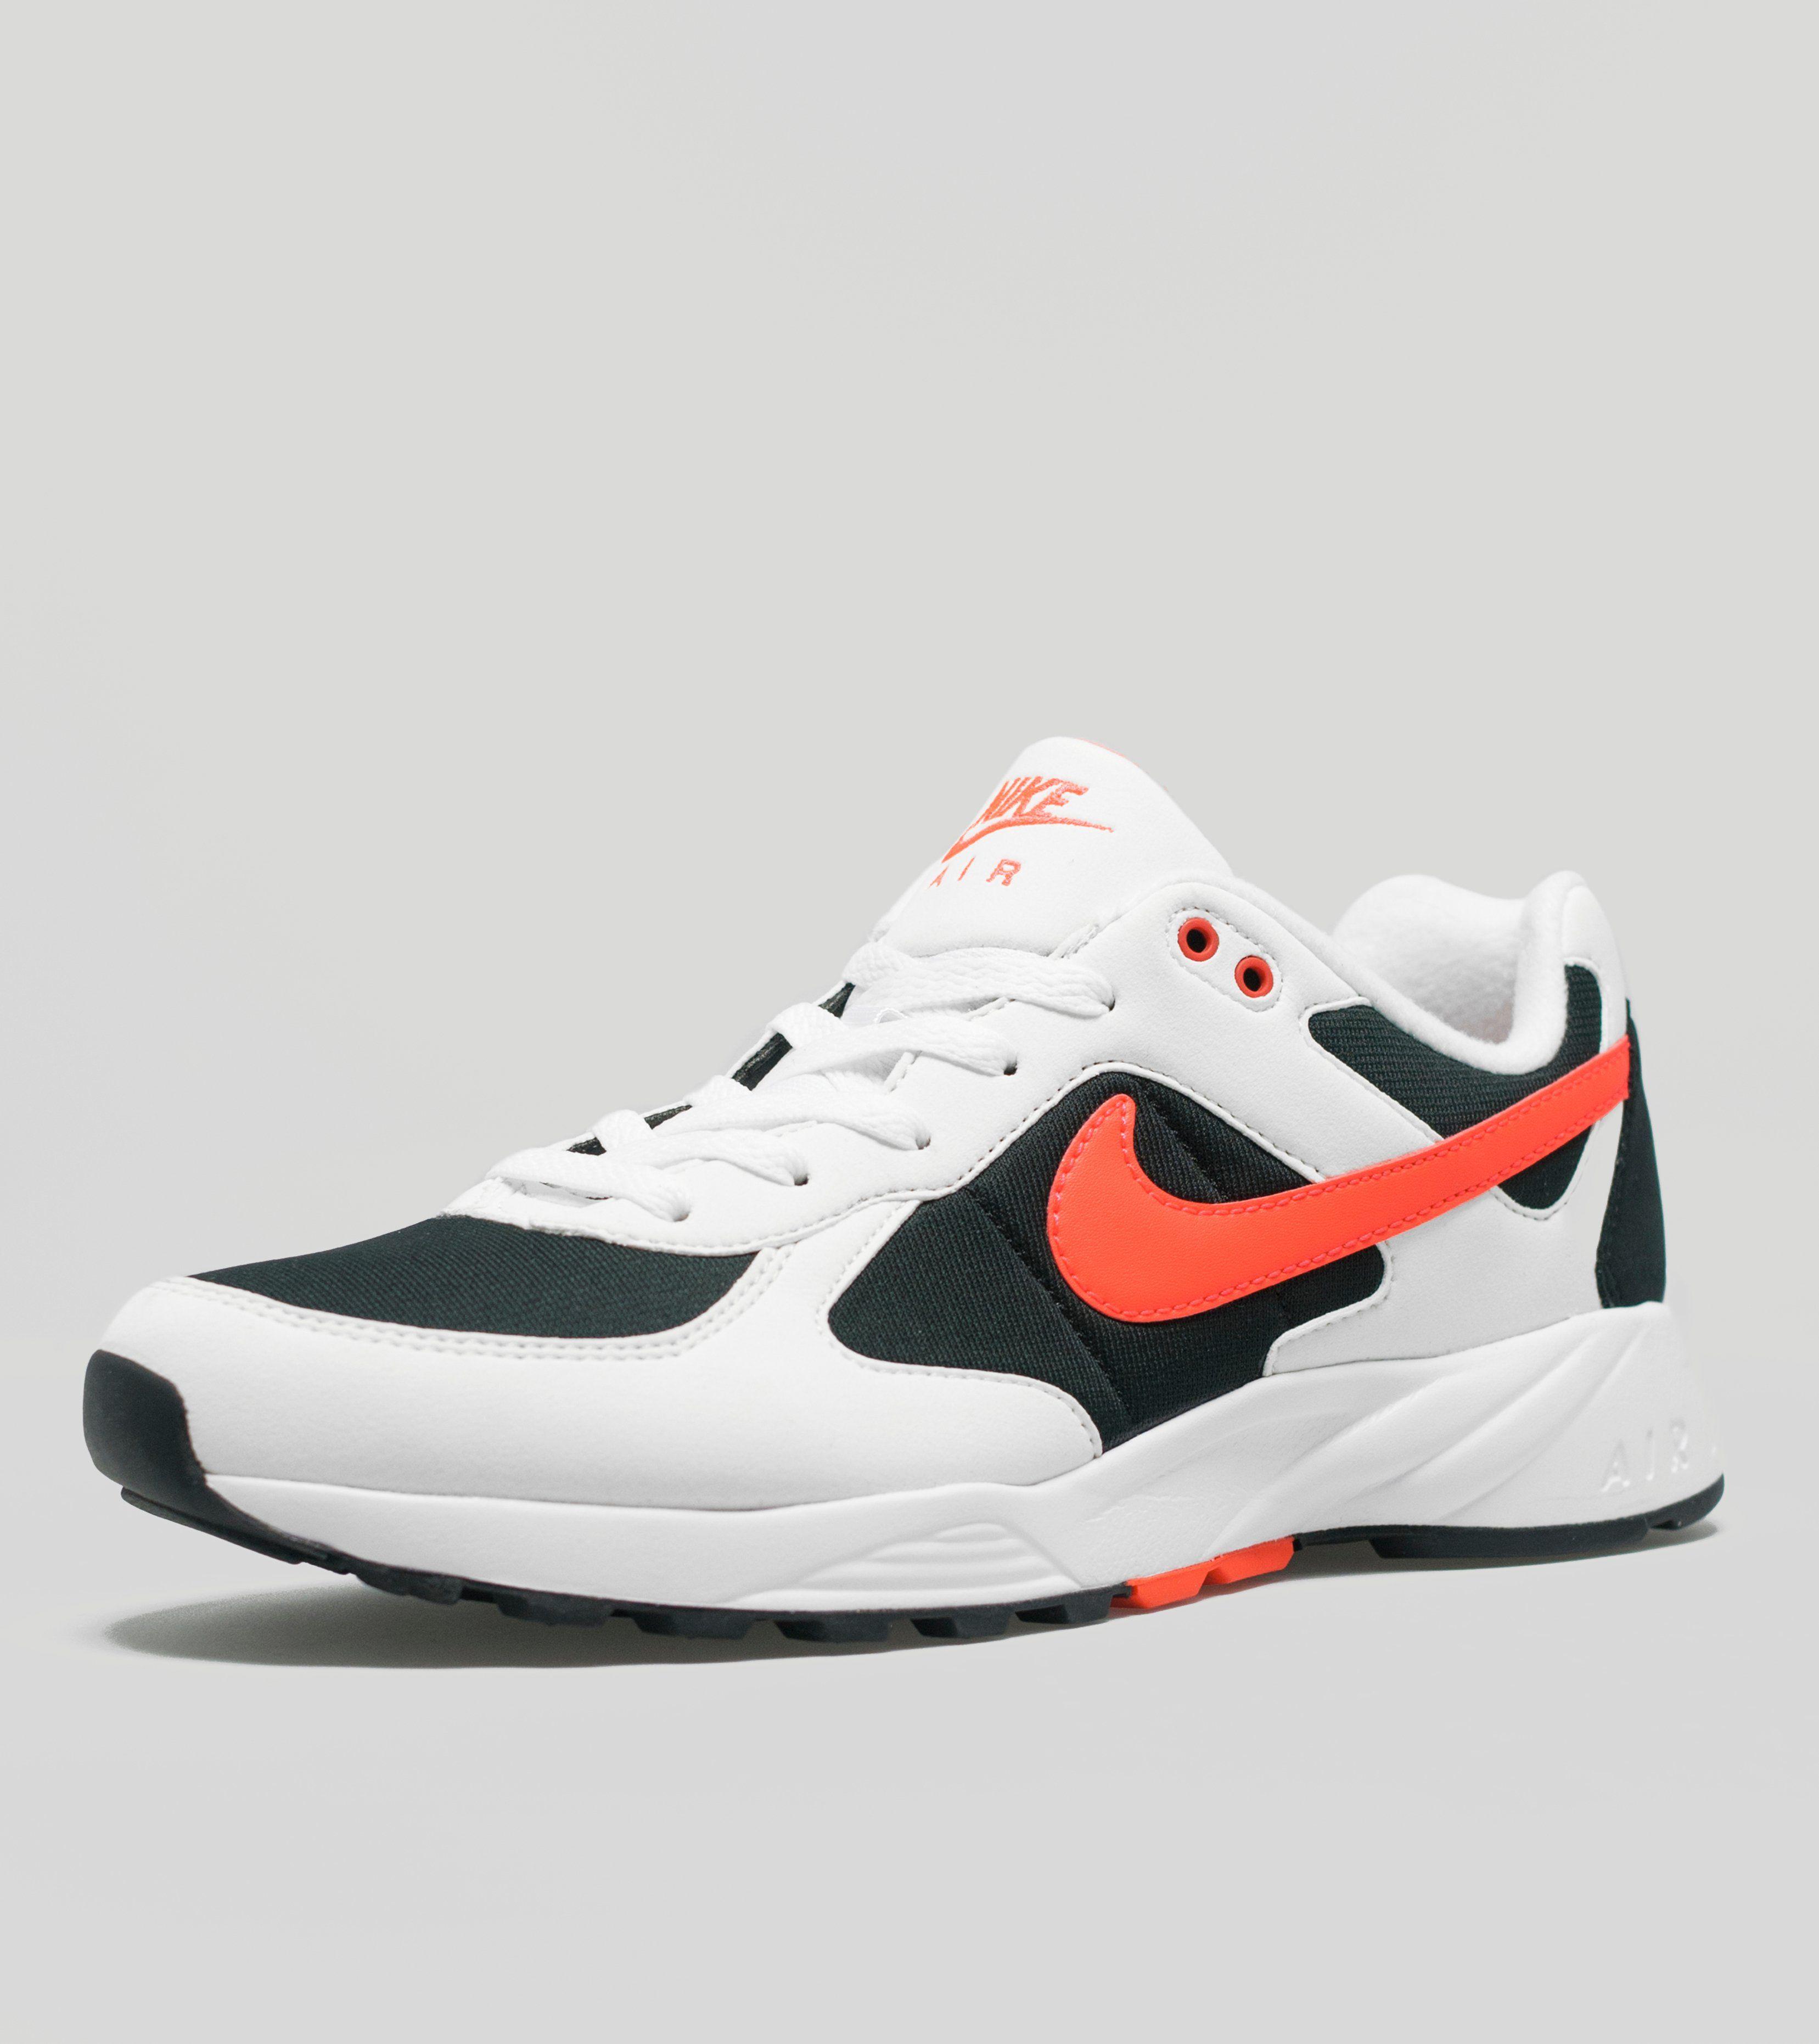 7bdbb34451c9 Nike Air Icarus OG